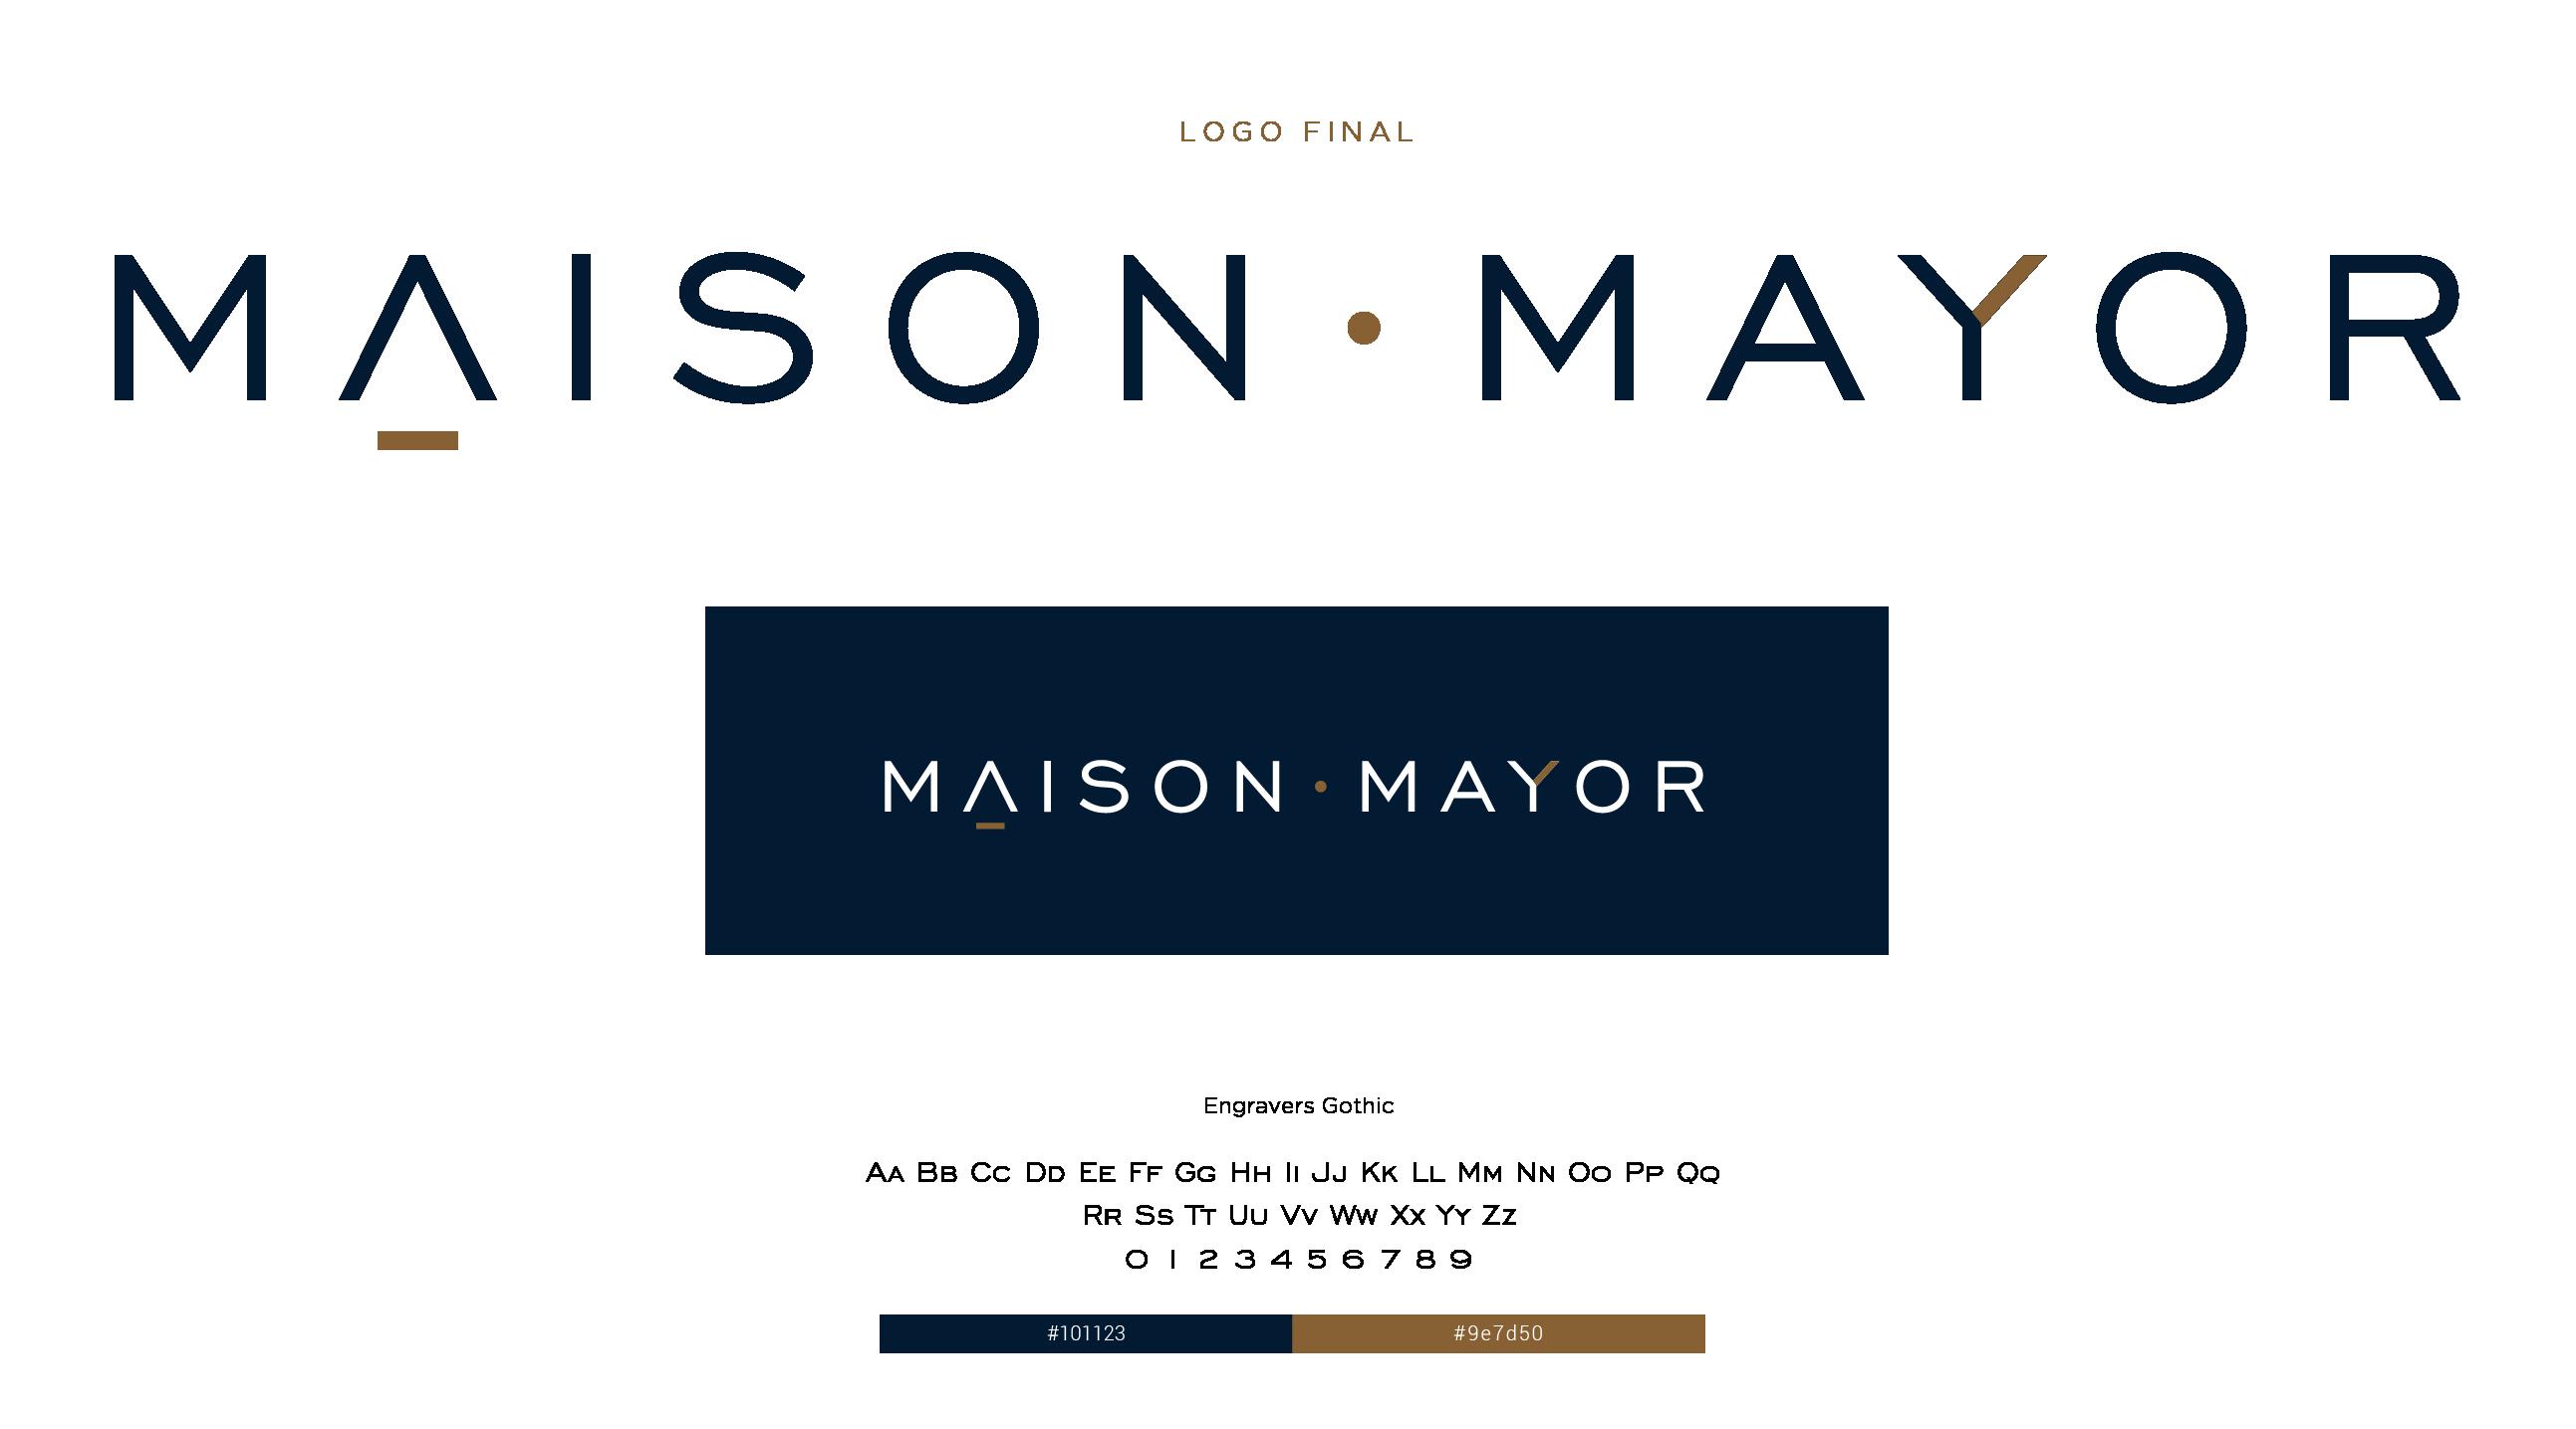 logo final maison mayor